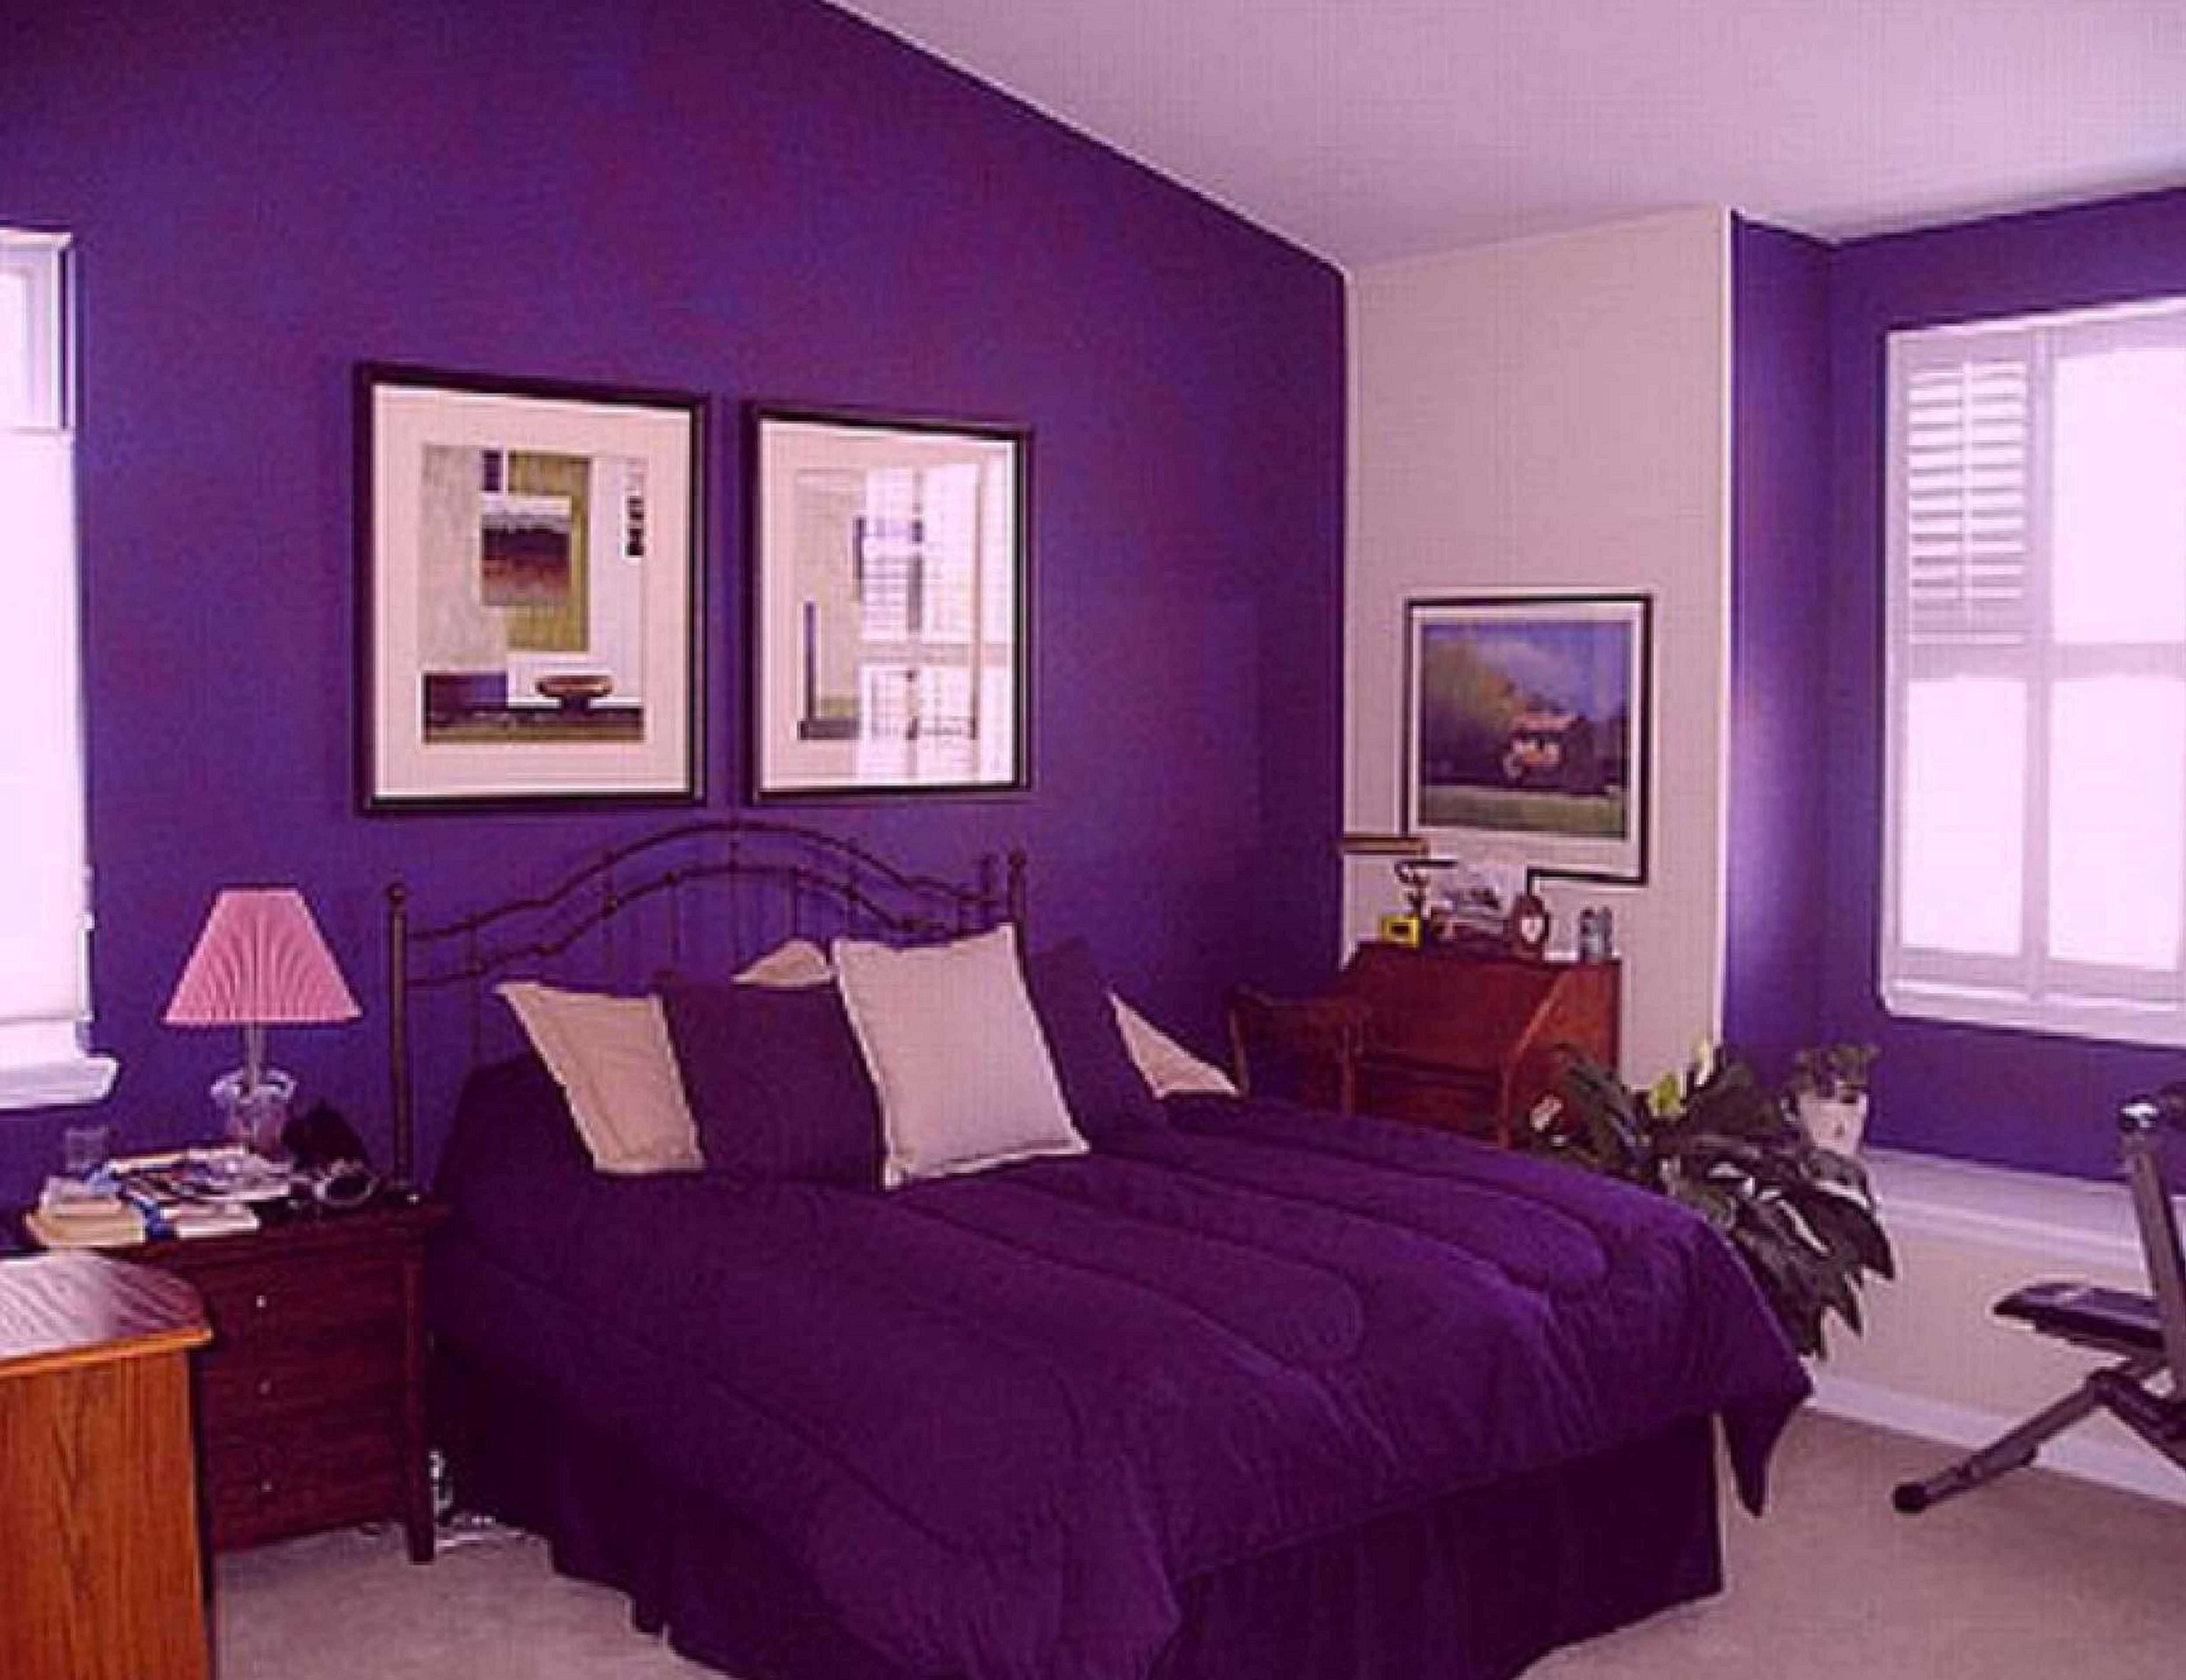 20 Beautiful Bedroom Paint Color Ideas For Cozy Bedding Design Purple Bedroom Decor Purple Bedrooms Purple Bedroom Design